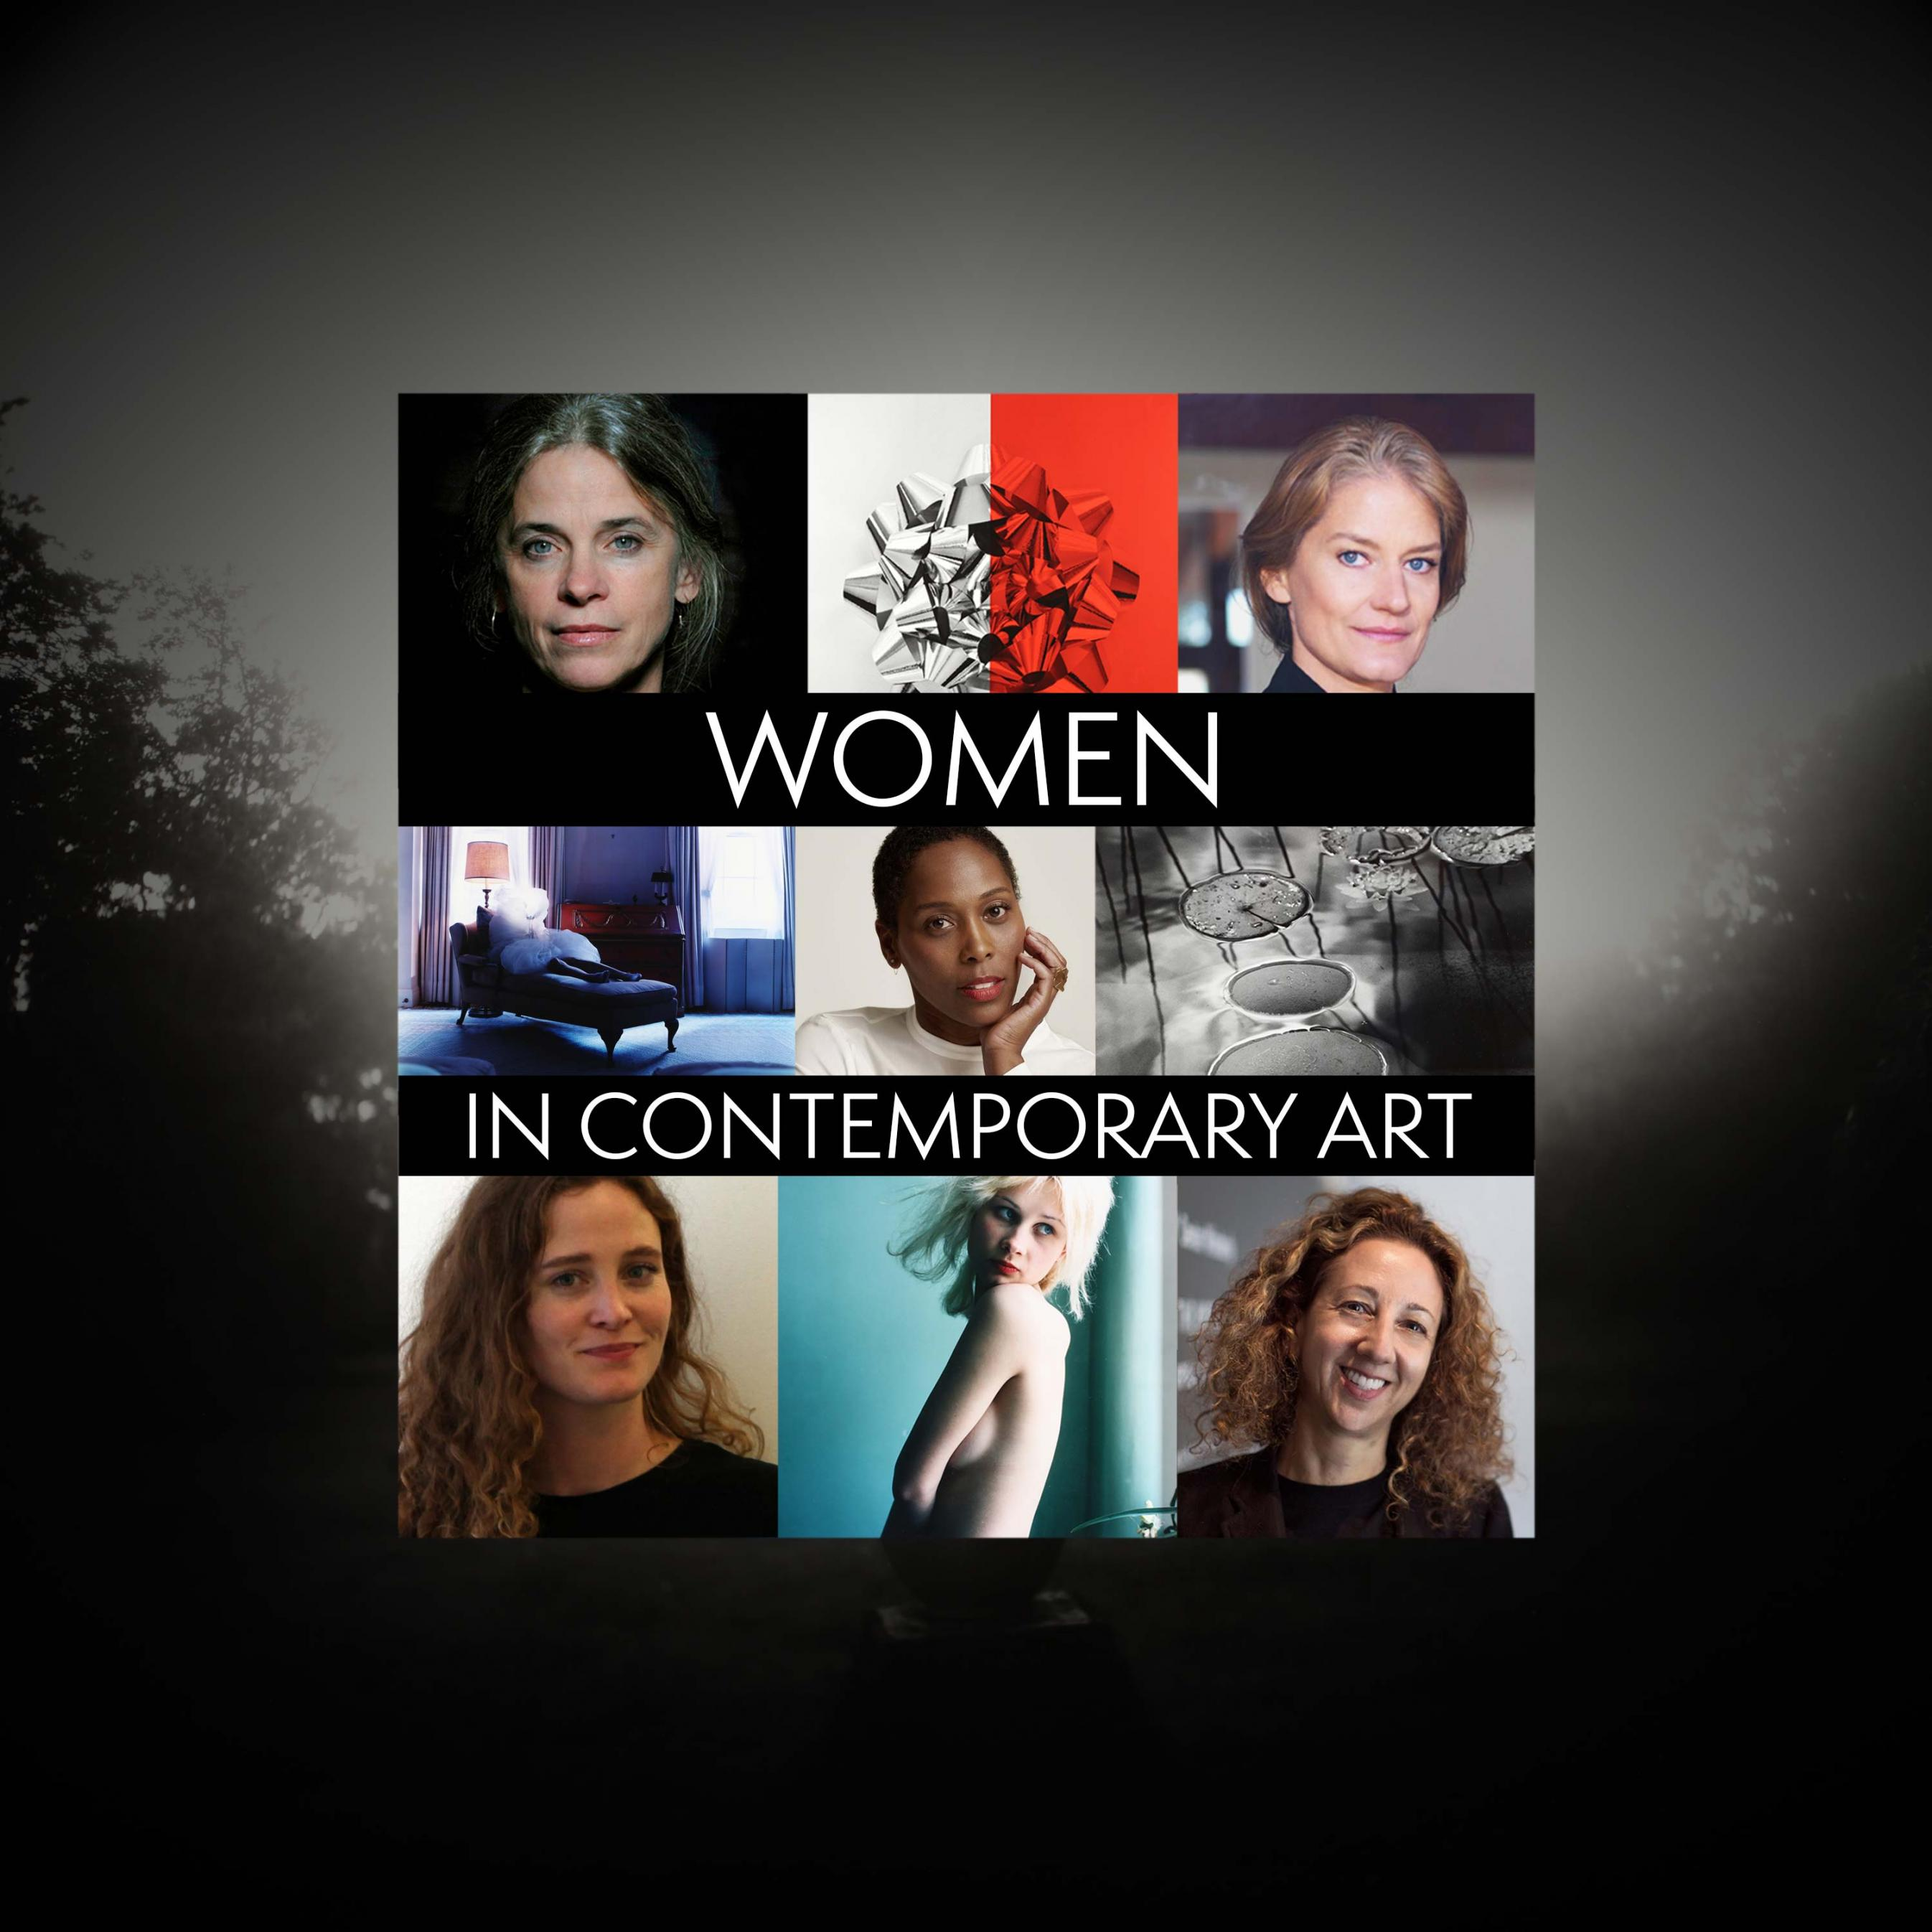 women-in-contemporary-art